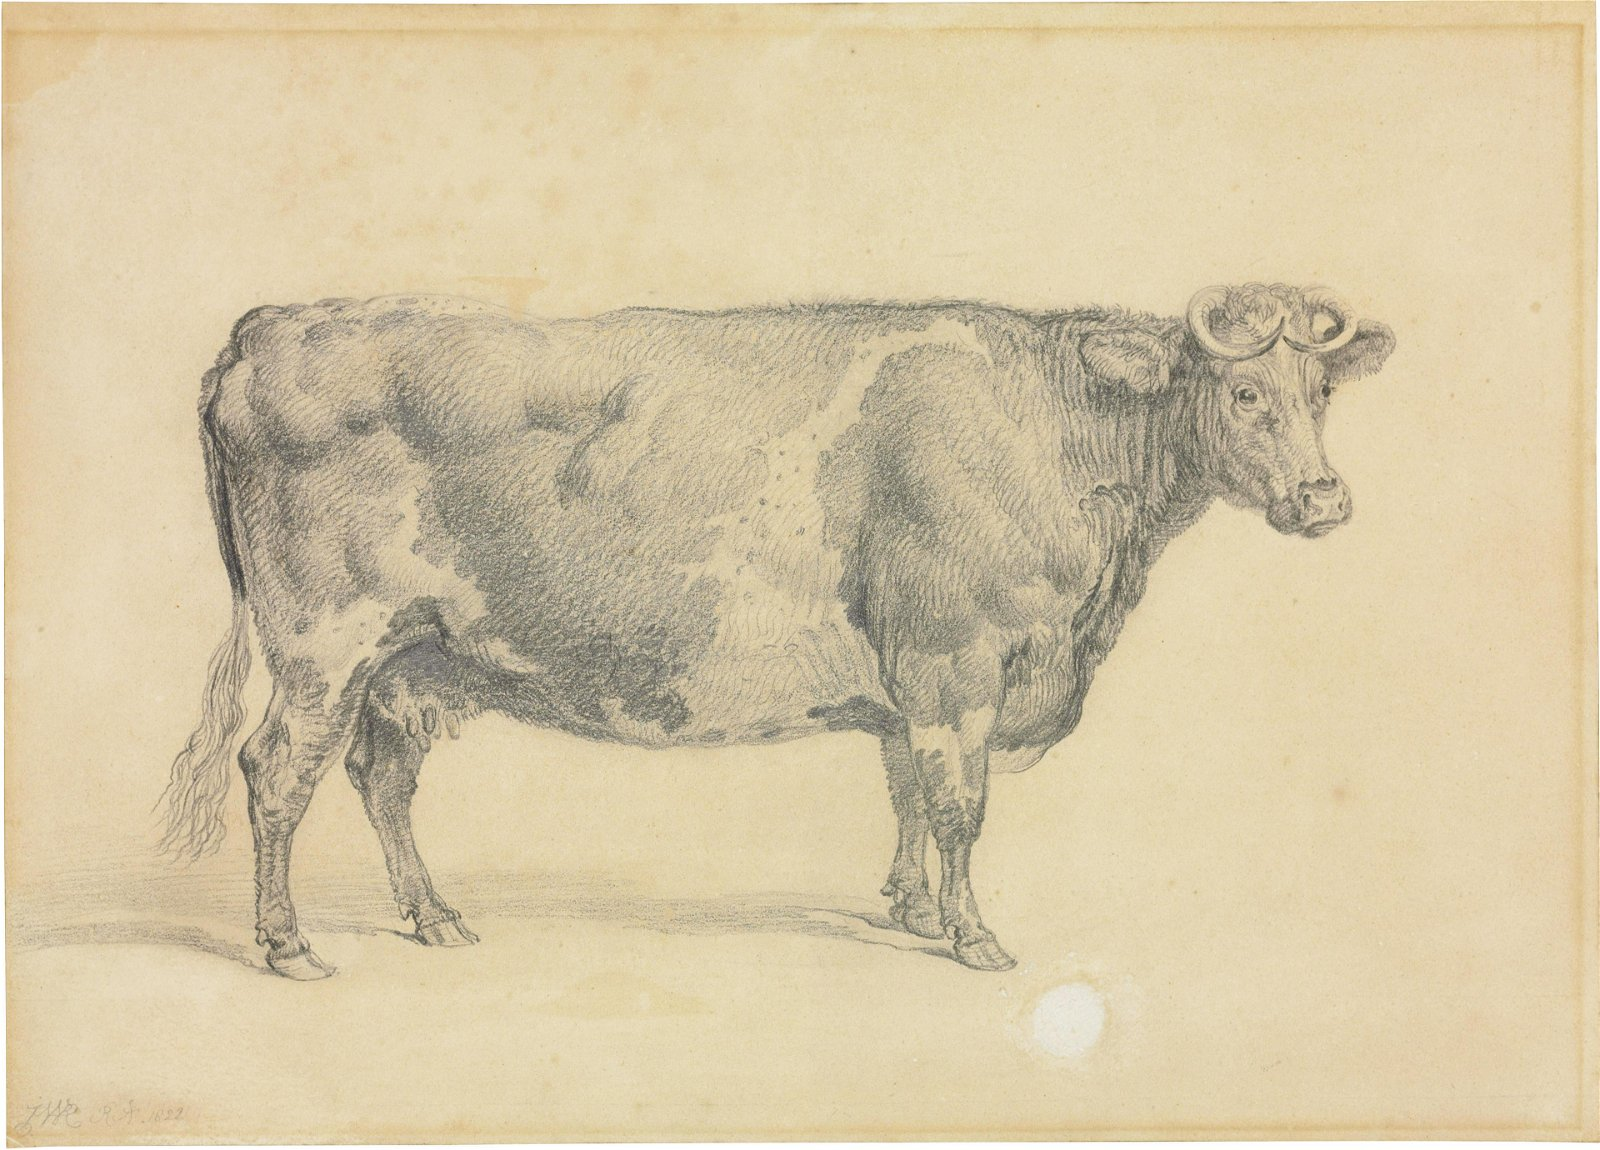 James Ward, R.A. (London 1769-1859 Cheshunt)